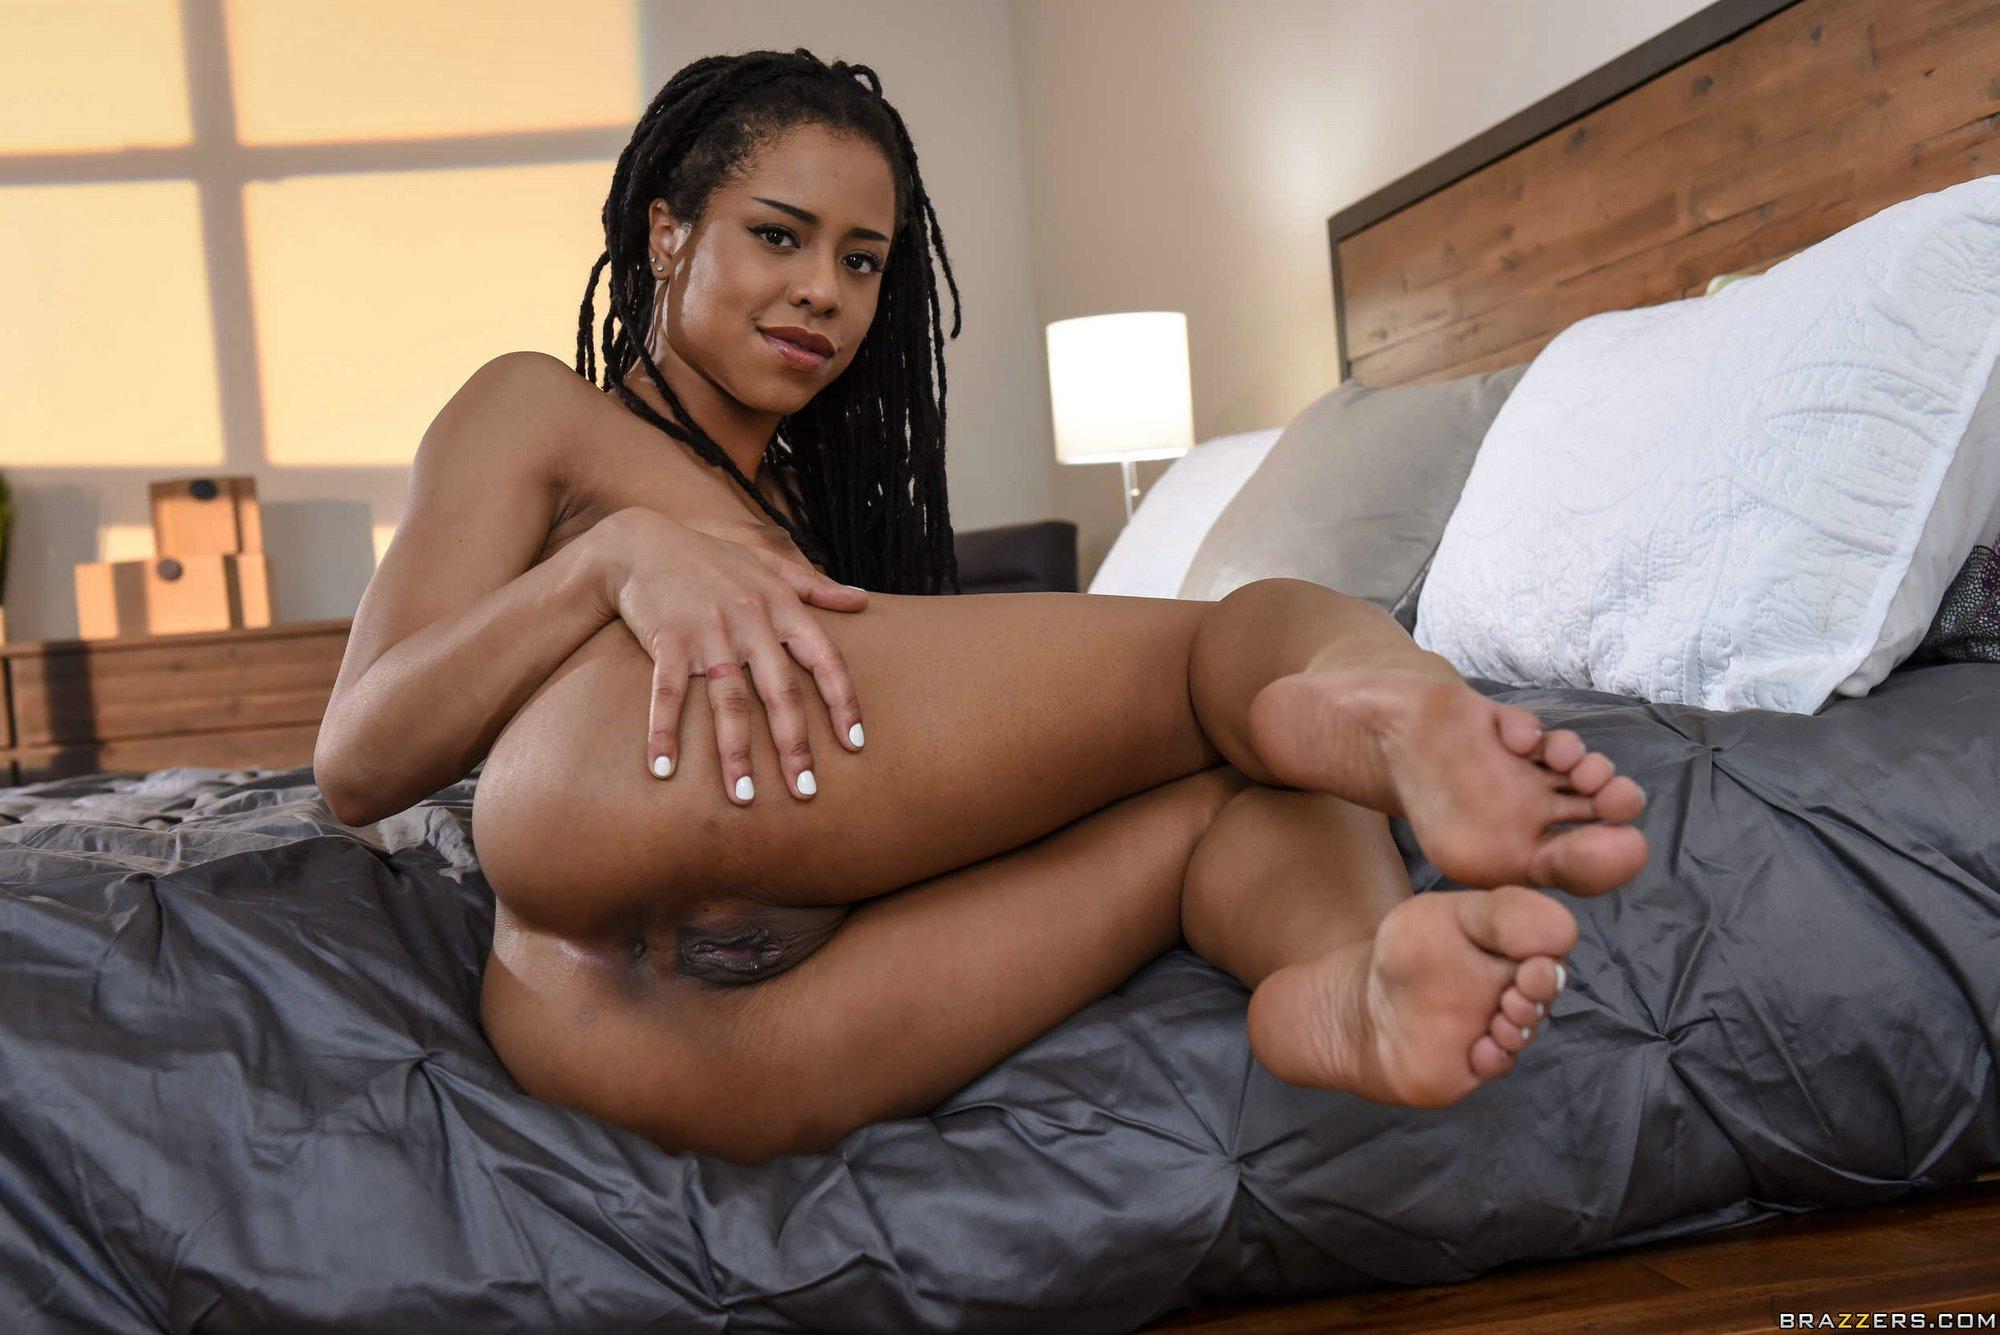 Kira Noir Teasing With Hot Nude Body On Bed - My Pornstar Book-7707